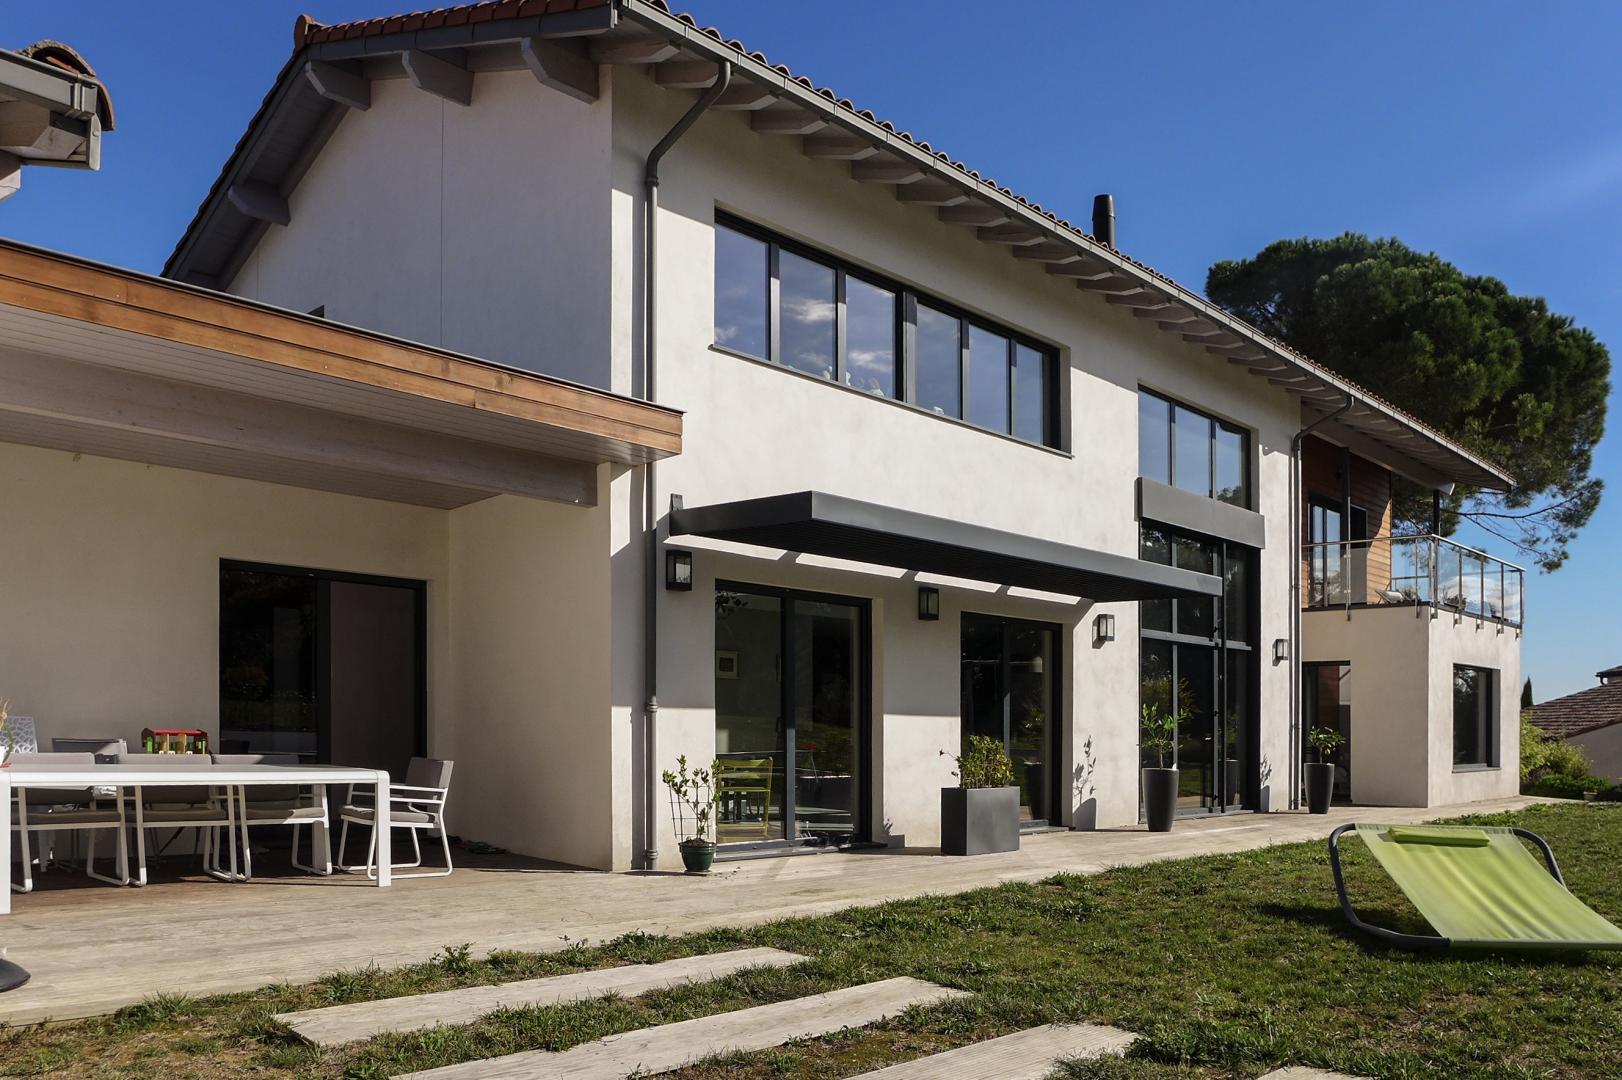 architecte bioclimatique 31 franz schneider architecte architecte haute garonne midi. Black Bedroom Furniture Sets. Home Design Ideas